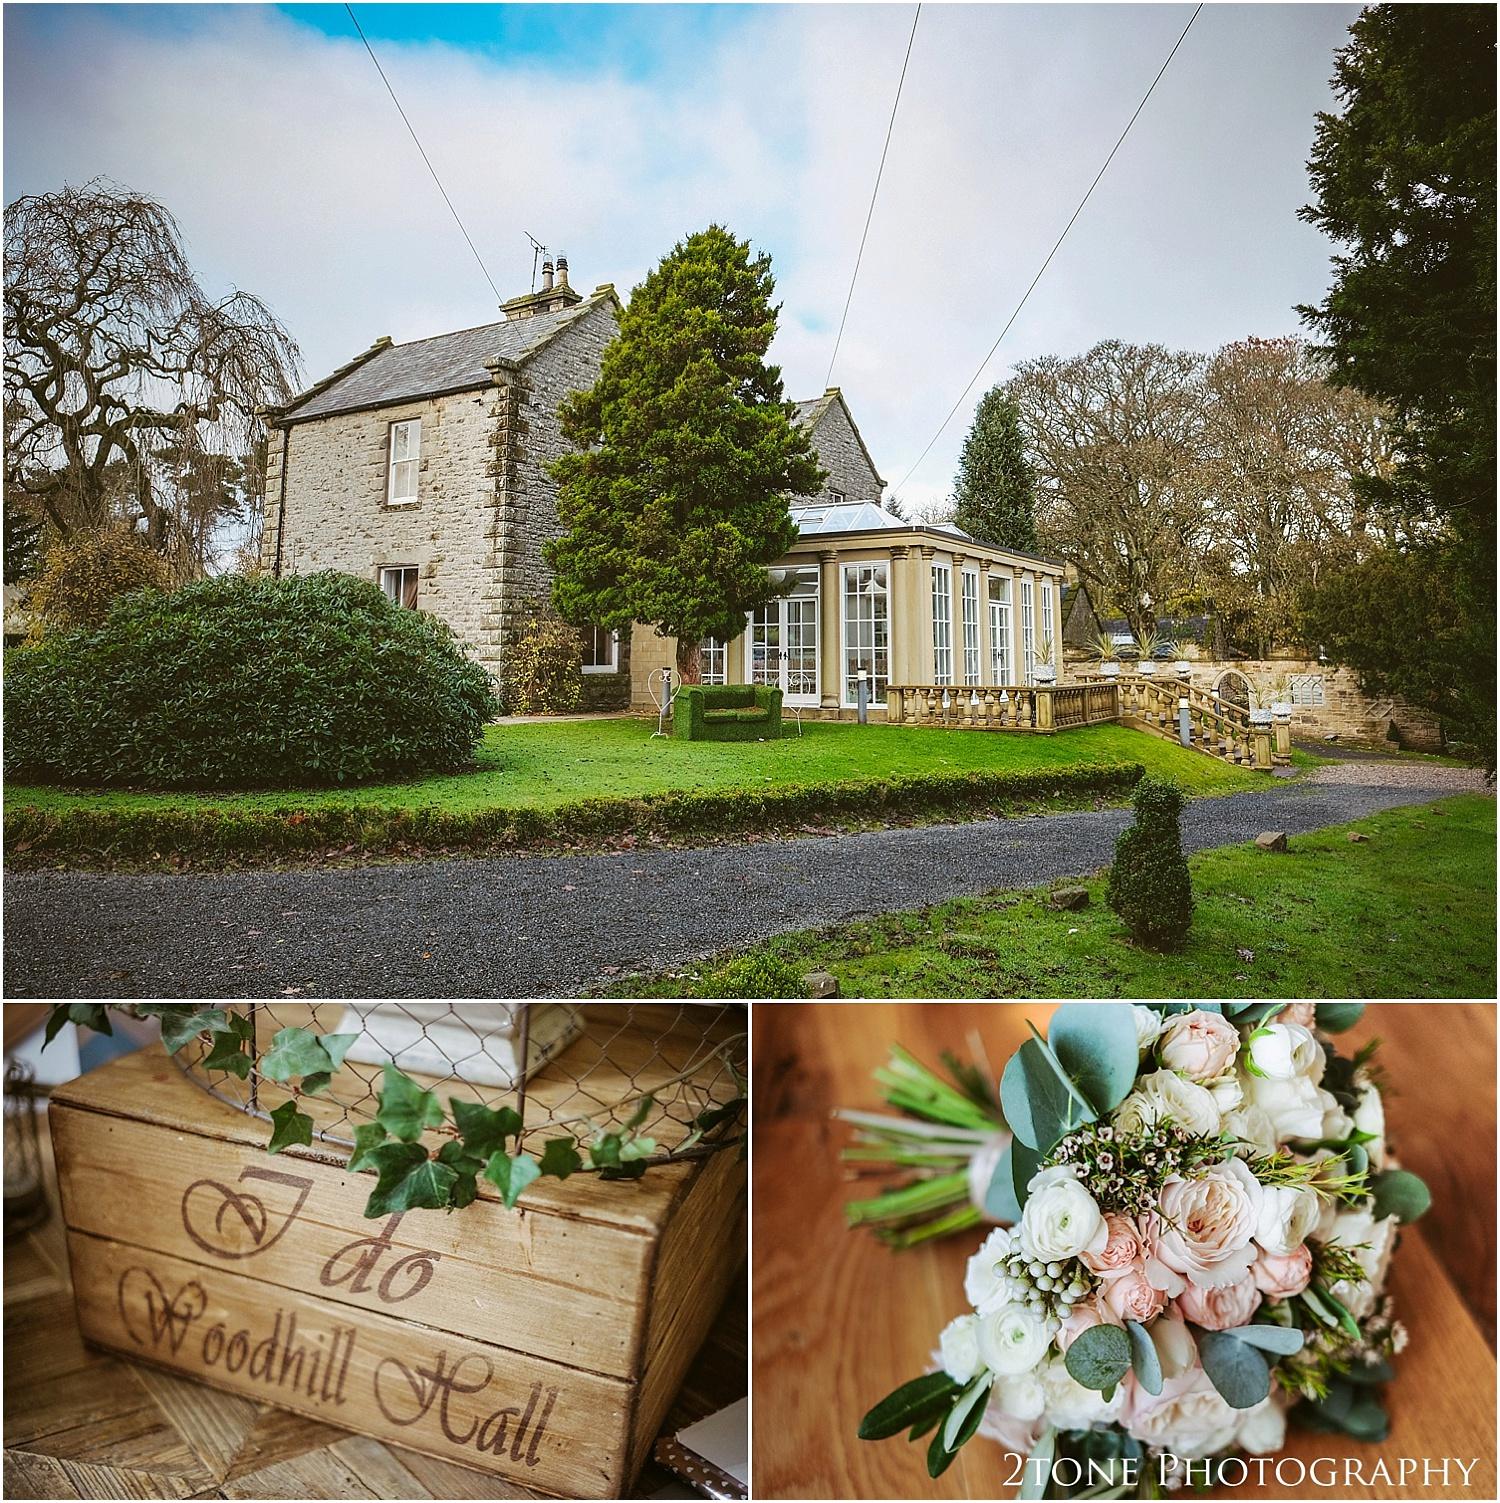 Woodhill Hall wedding 01.jpg